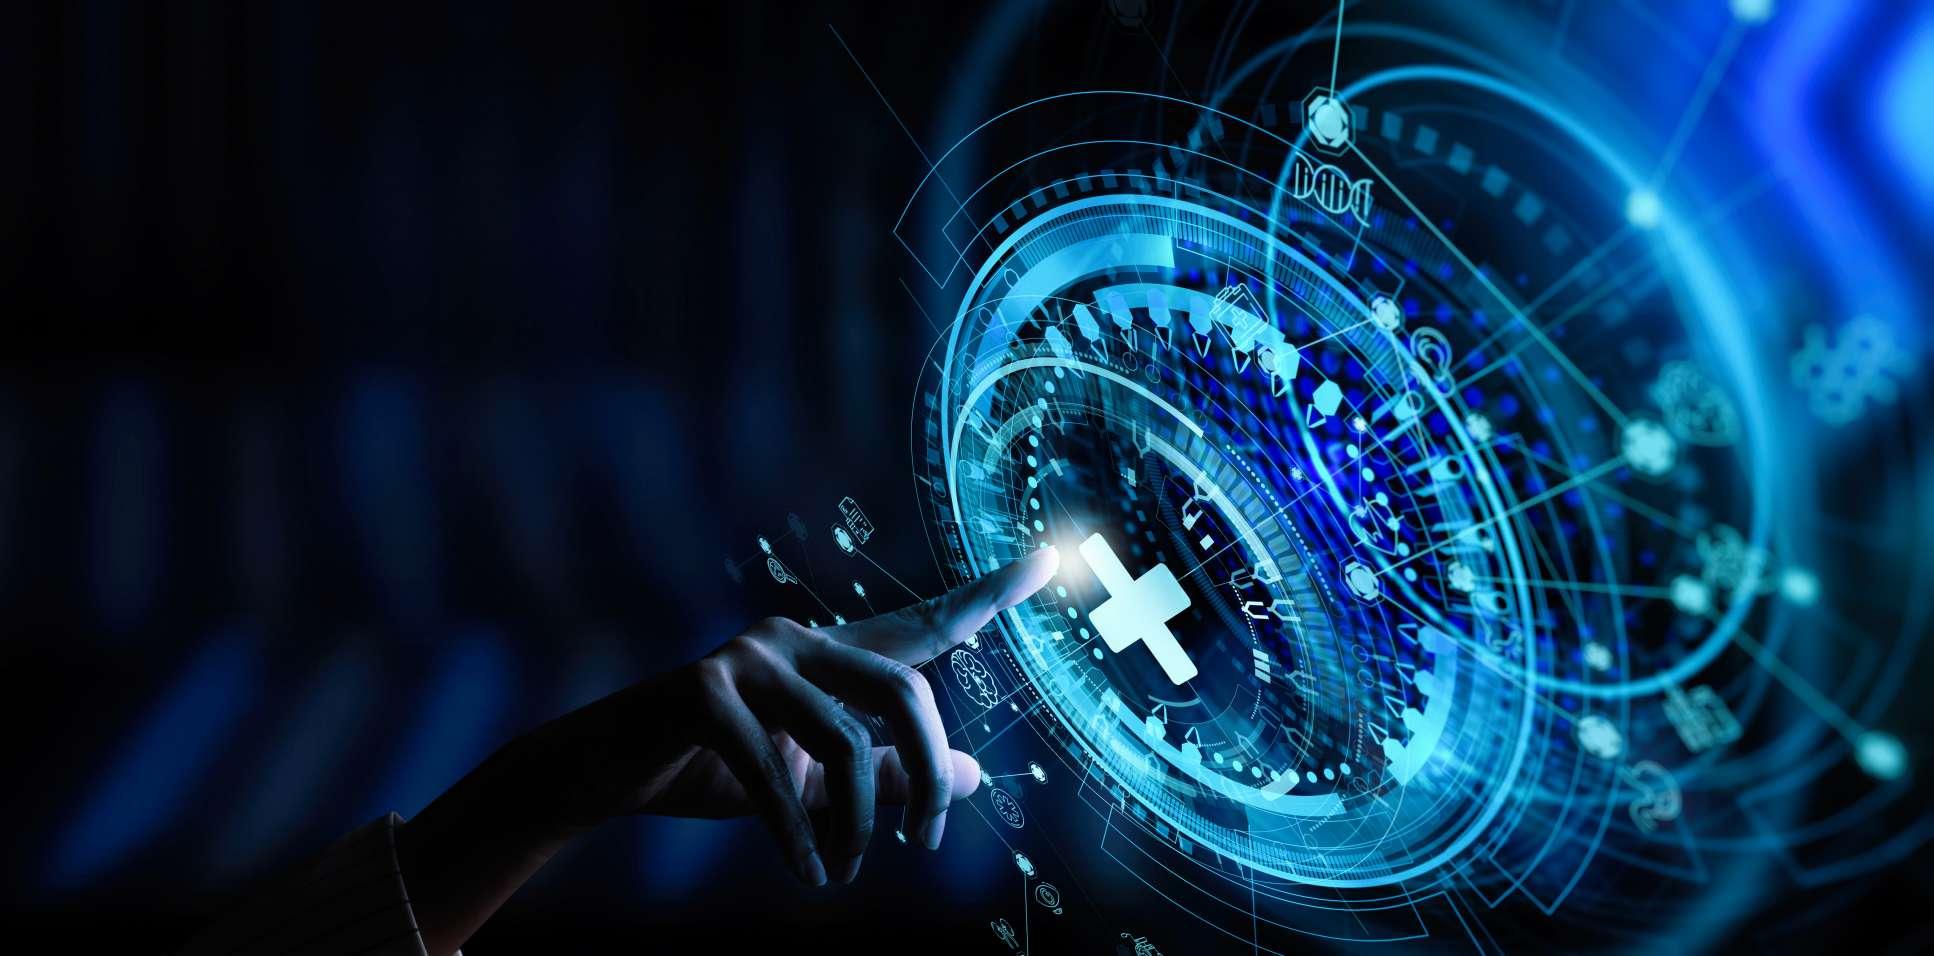 Photo illustration of medical technology data network